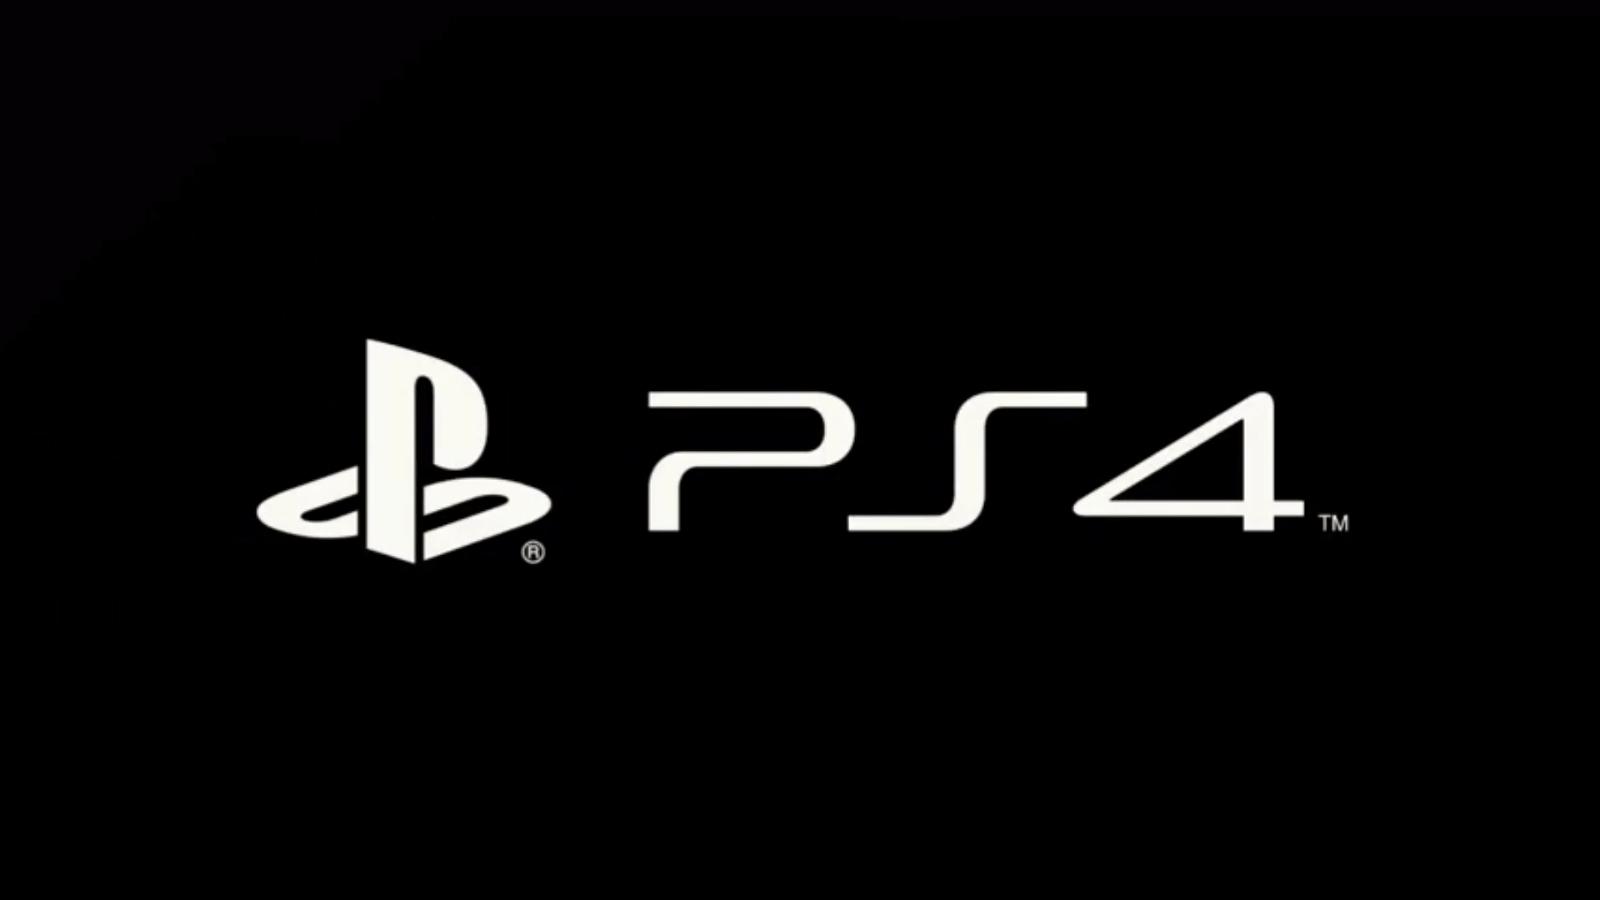 Sony Sells 50 Million PlayStation 4 Consoles Worldwide 2